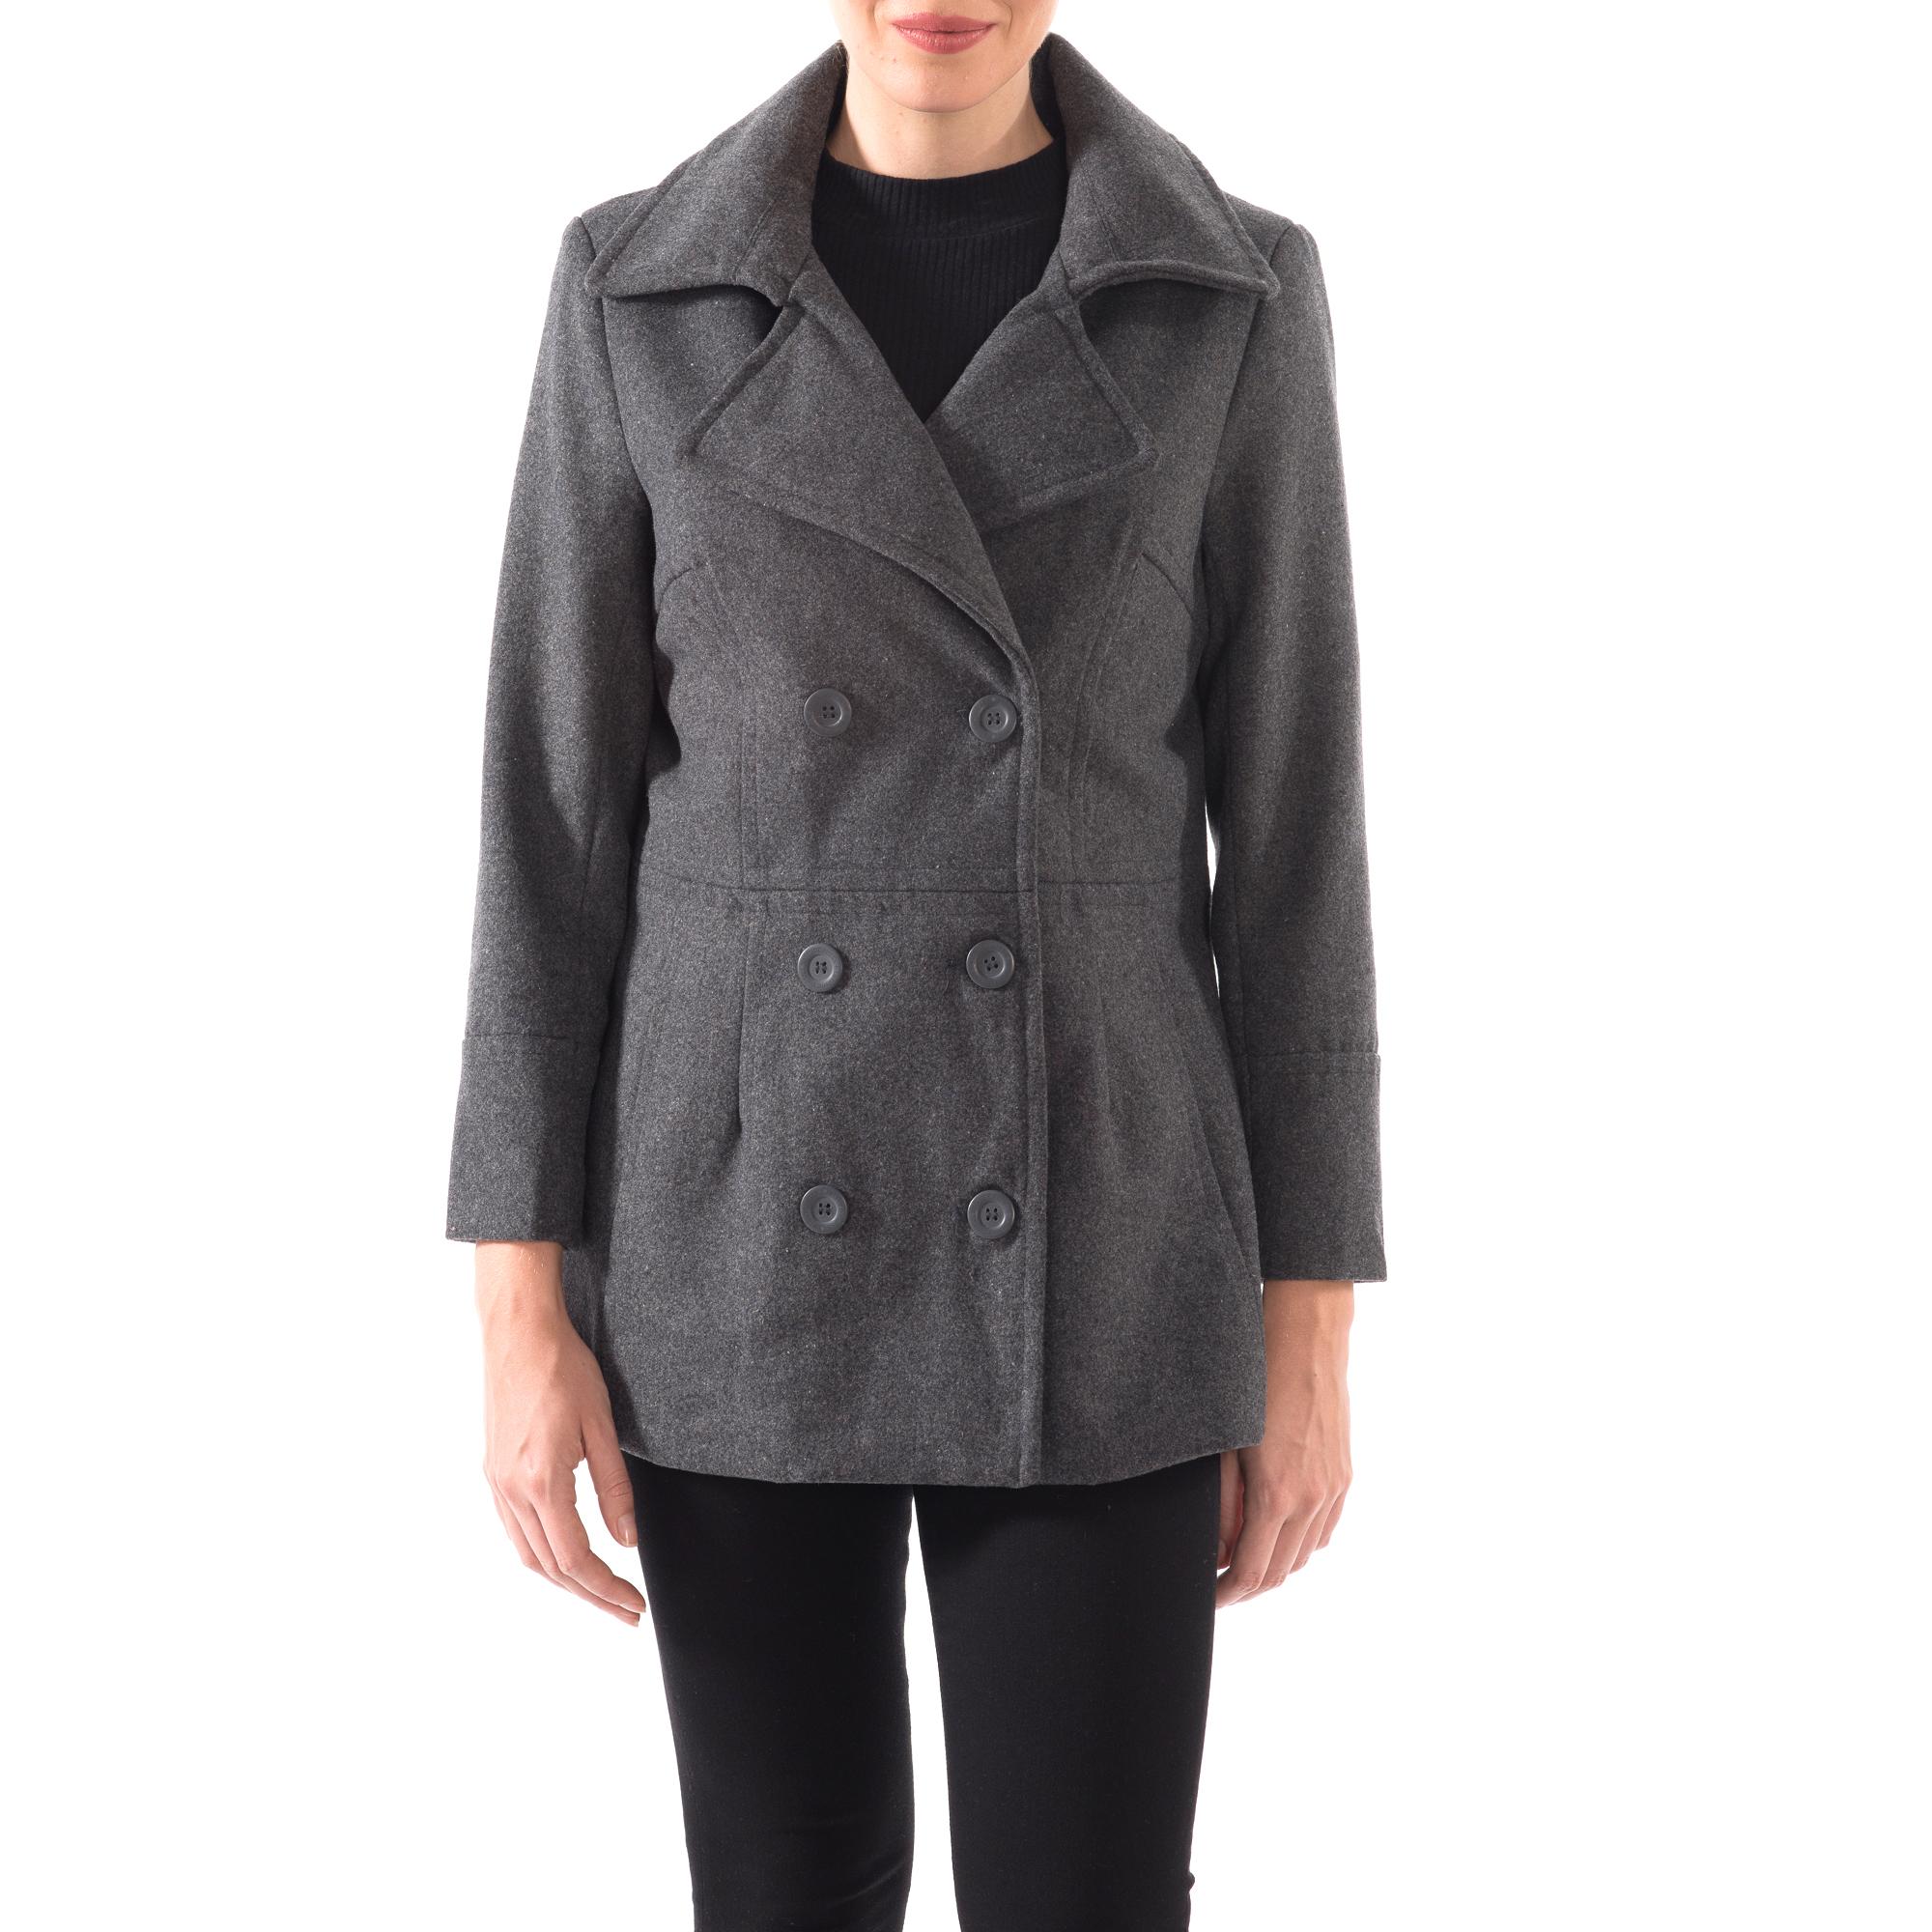 Alpine-Swiss-Emma-Womens-Peacoat-Jacket-Wool-Blazer-Double-Breasted-Overcoat-New thumbnail 38